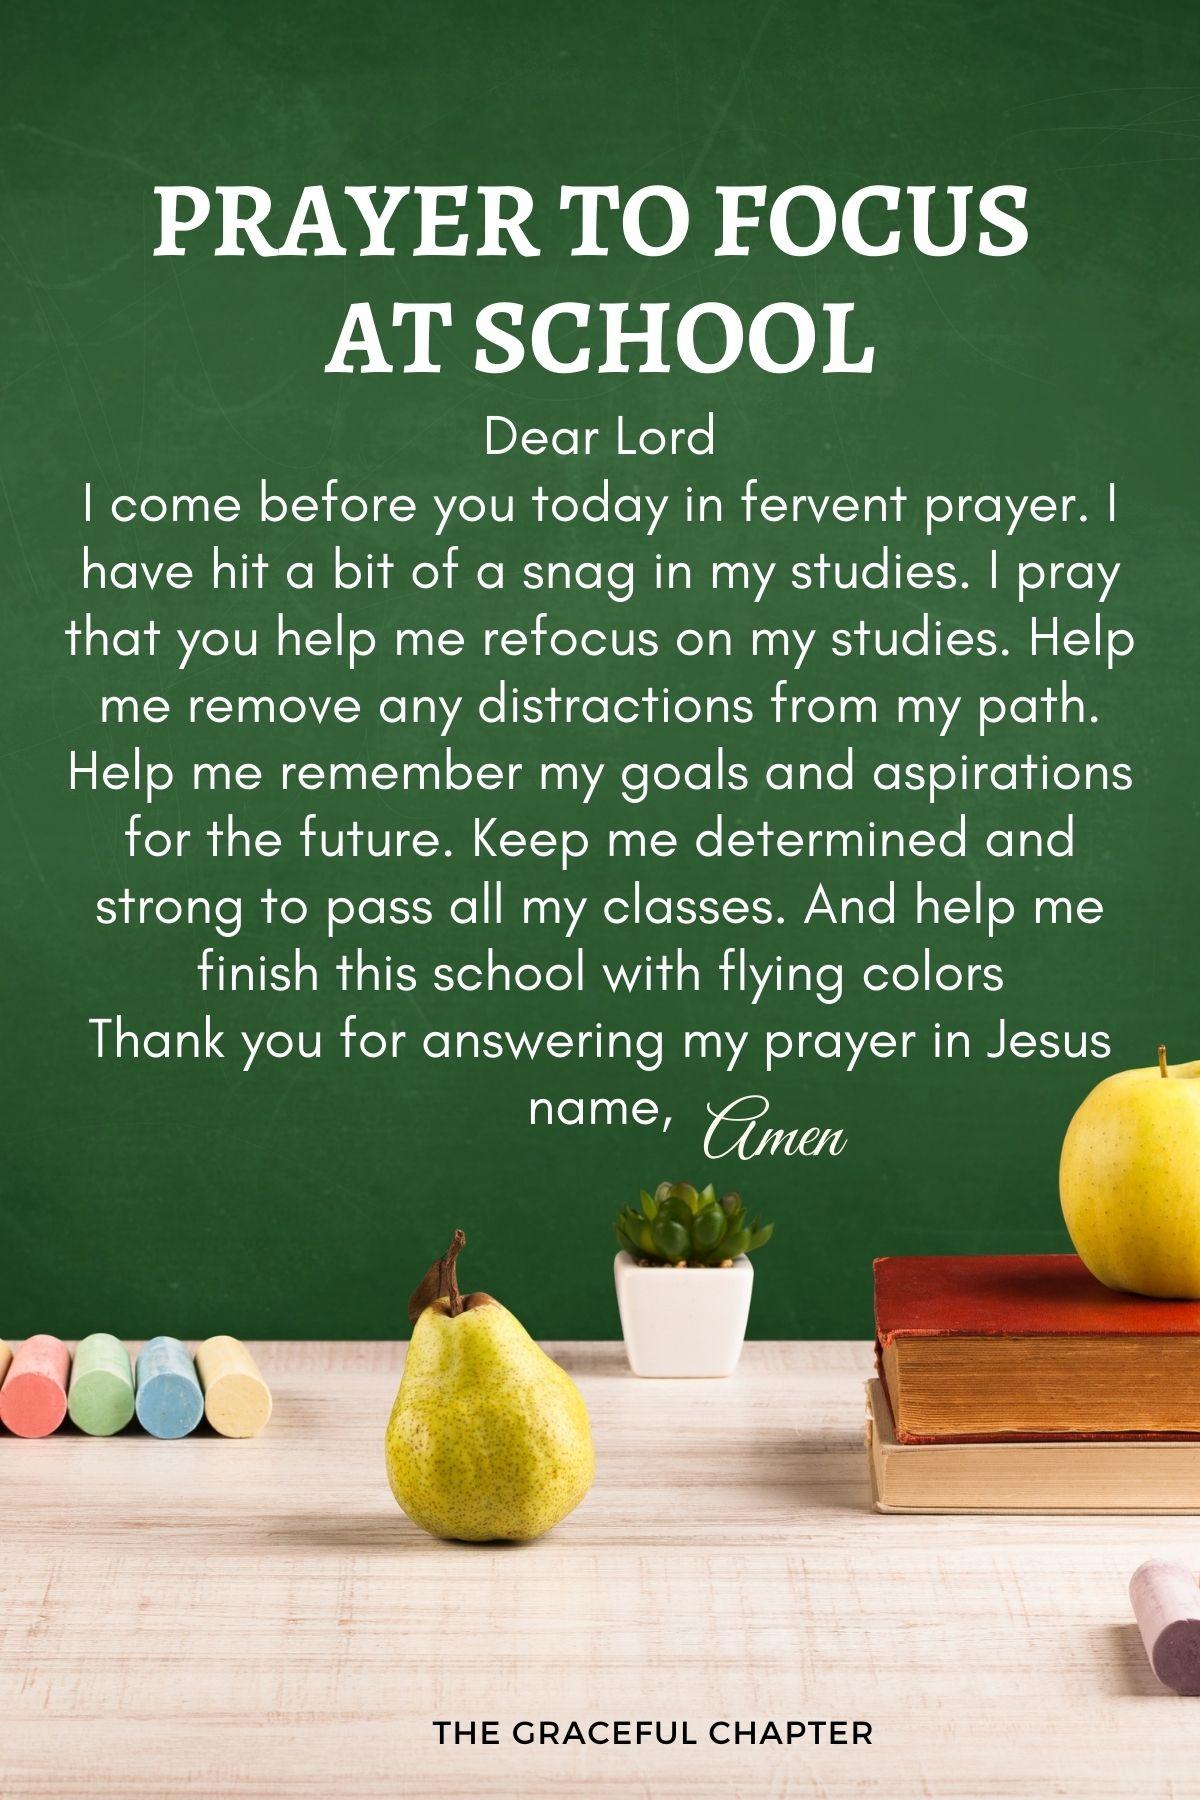 Prayers for school - Prayer to focus at school